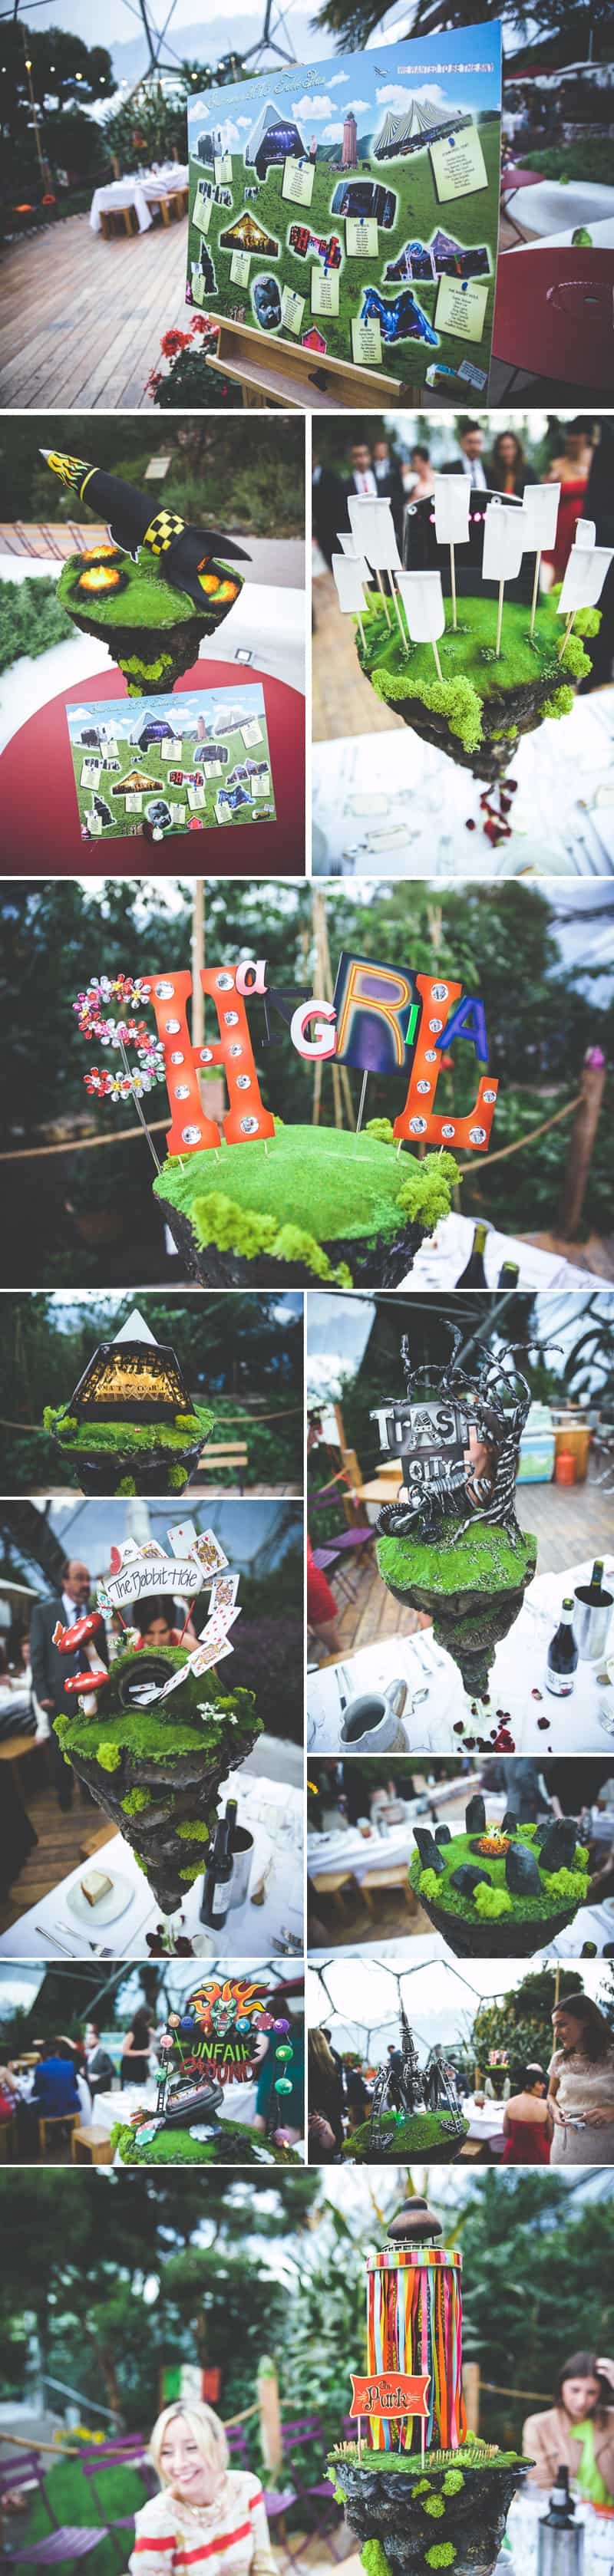 Glastonbury Eden Project Wedding Zip Lining Festival Themed 5